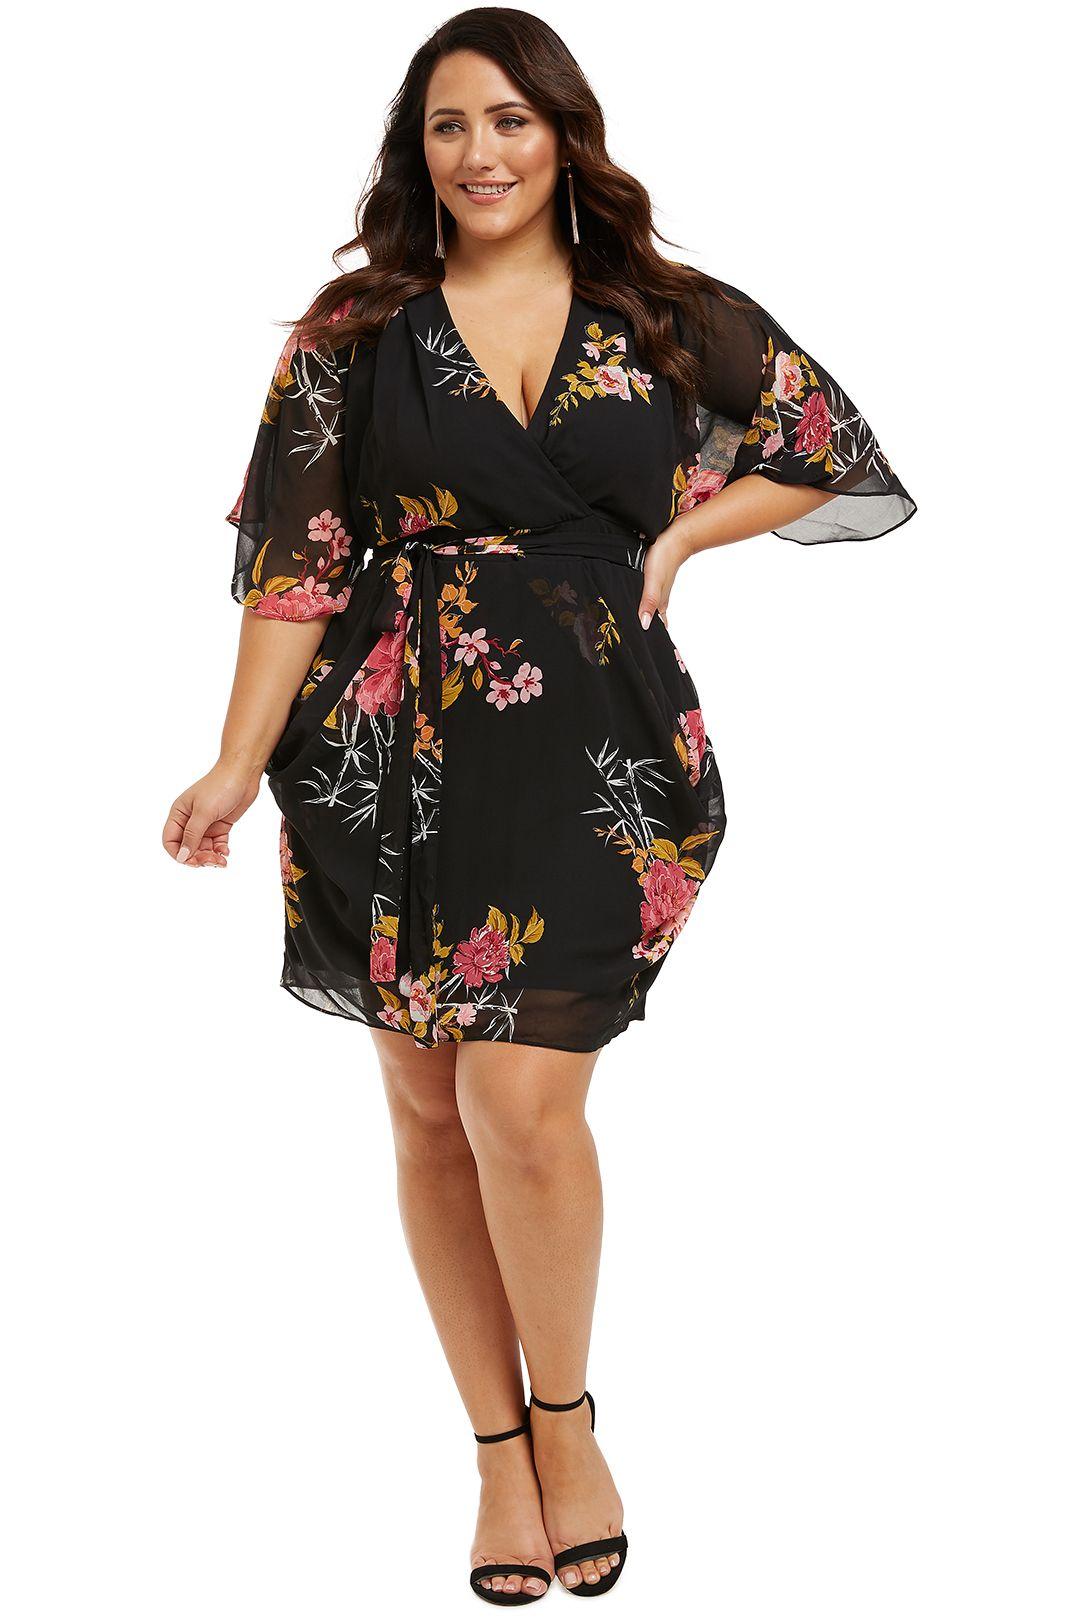 City-Chic-Beloved-Wrap-Dress-Black-Front